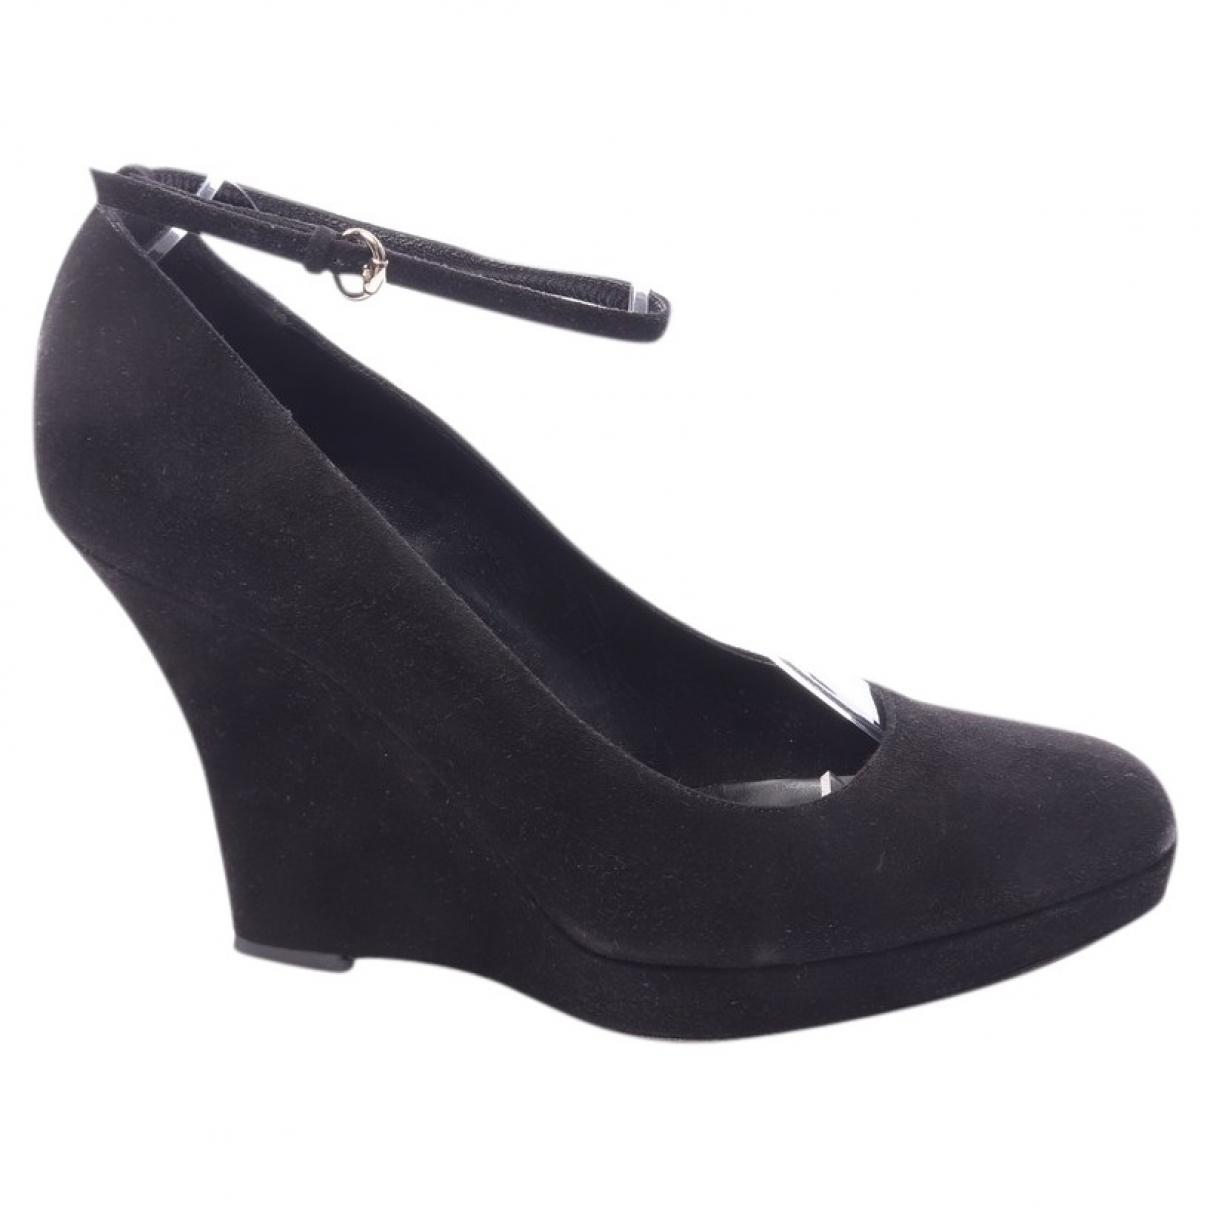 Gucci \N Black Leather Heels for Women 39 EU